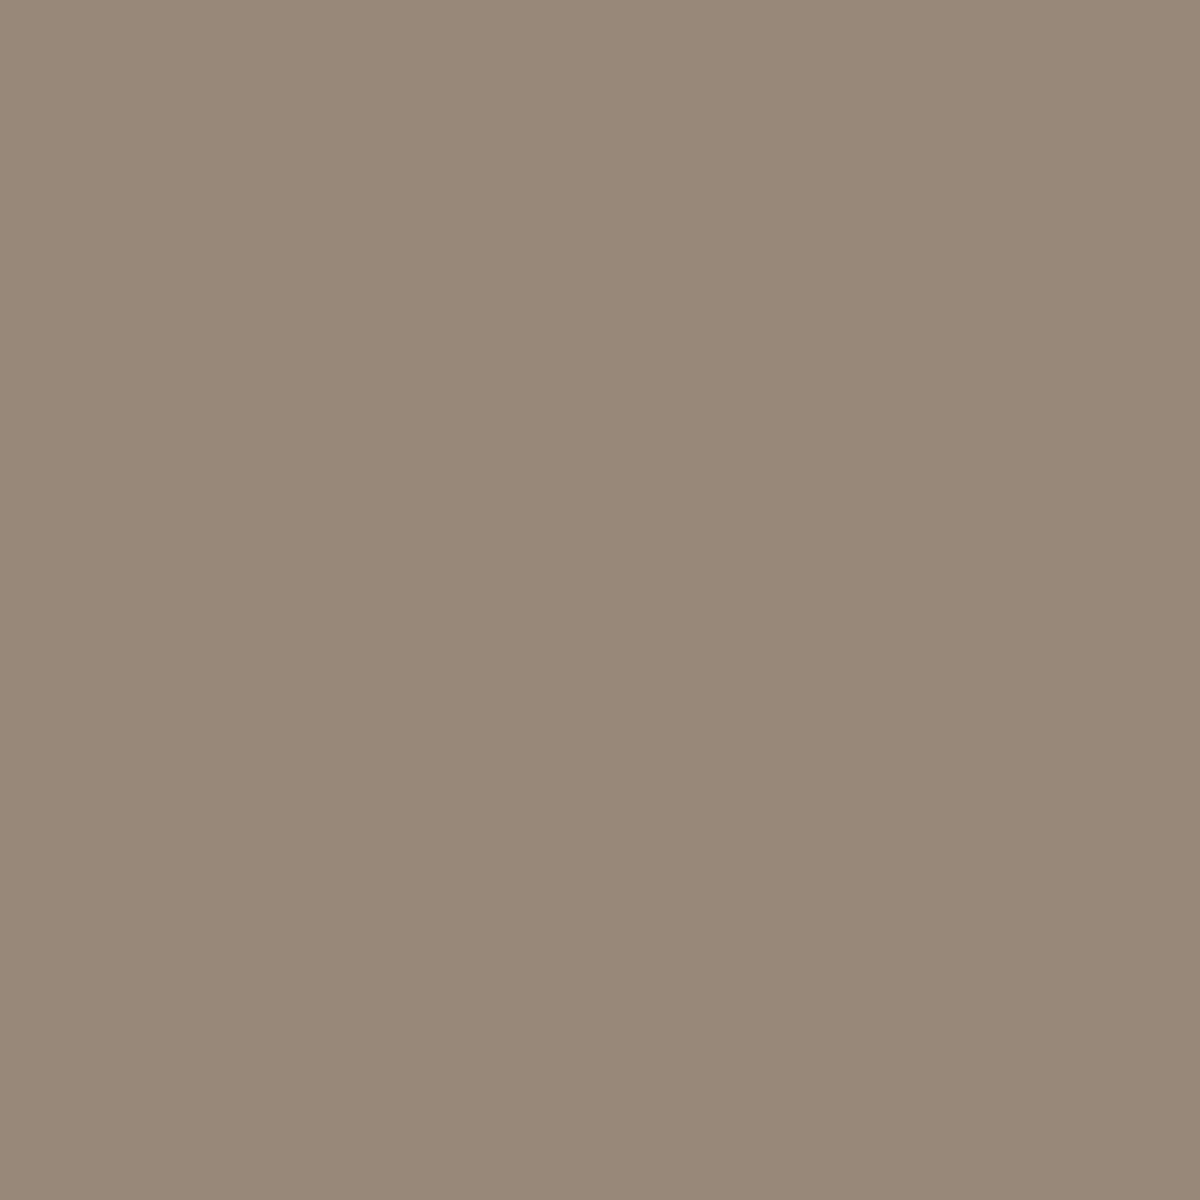 Ironworks Radiators Inc. farrow and ball Charleston grey paint finish